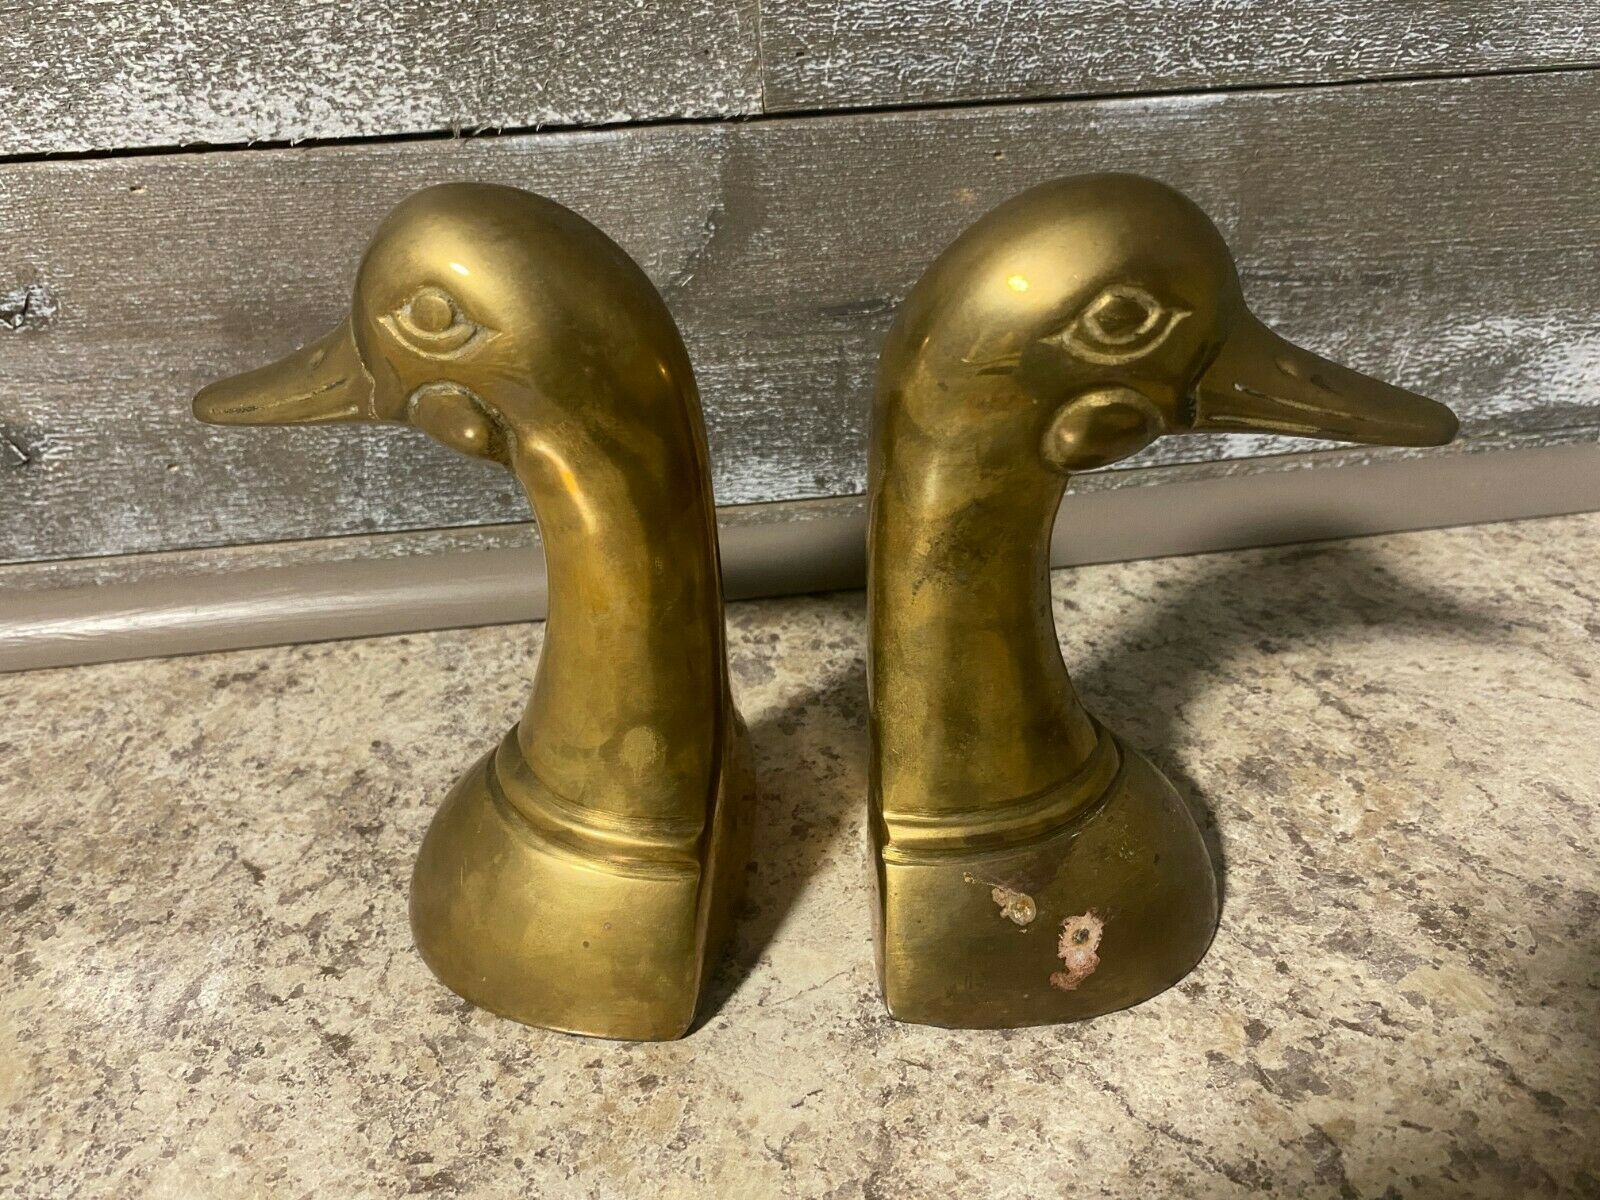 Pair of Vintage Brass Duck BOOK ENDS~Mallard Fowl Bird~Heavy 6 12 Tall Retro Mod Brass Bookends Home Library Decor